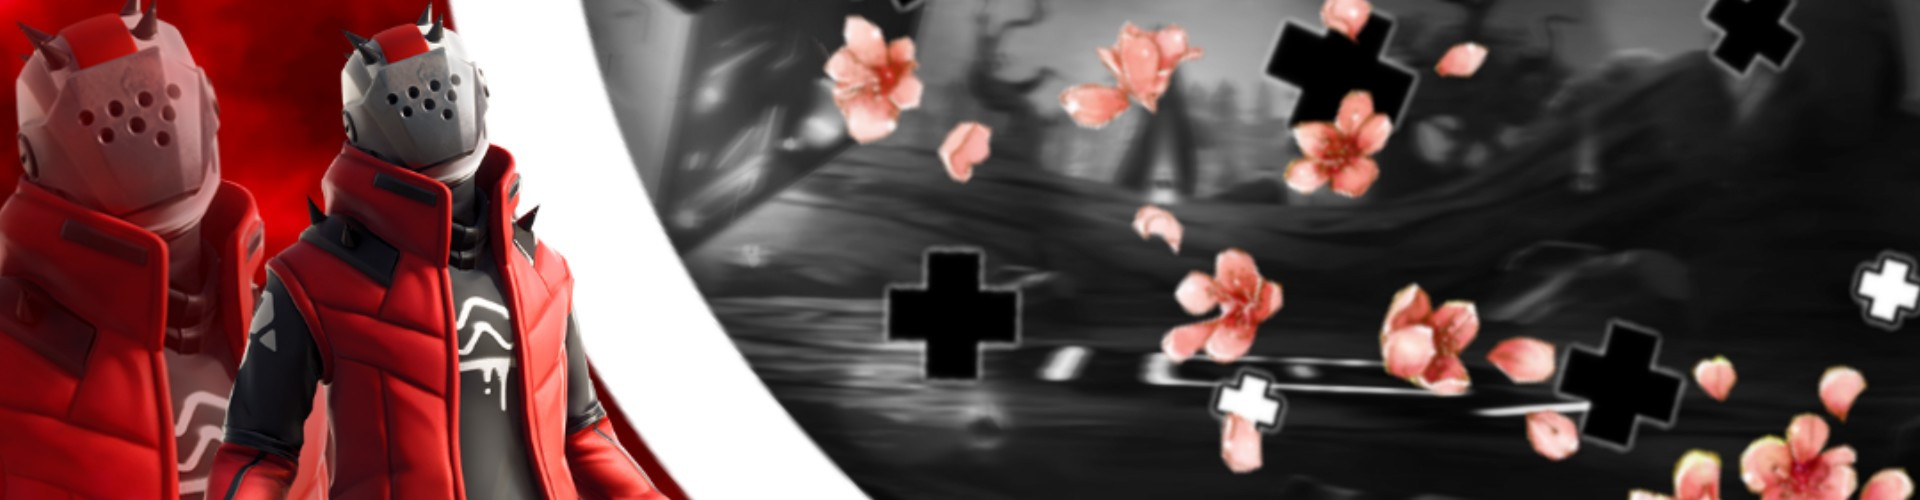 BANNER FREE TEMPLATE😈😷 EVIL TEAM😈 @itsevilyotxmmx @evilexx #fortnite #freetemplate #banner #fortnitebanner #evil #evilrc #evilontop